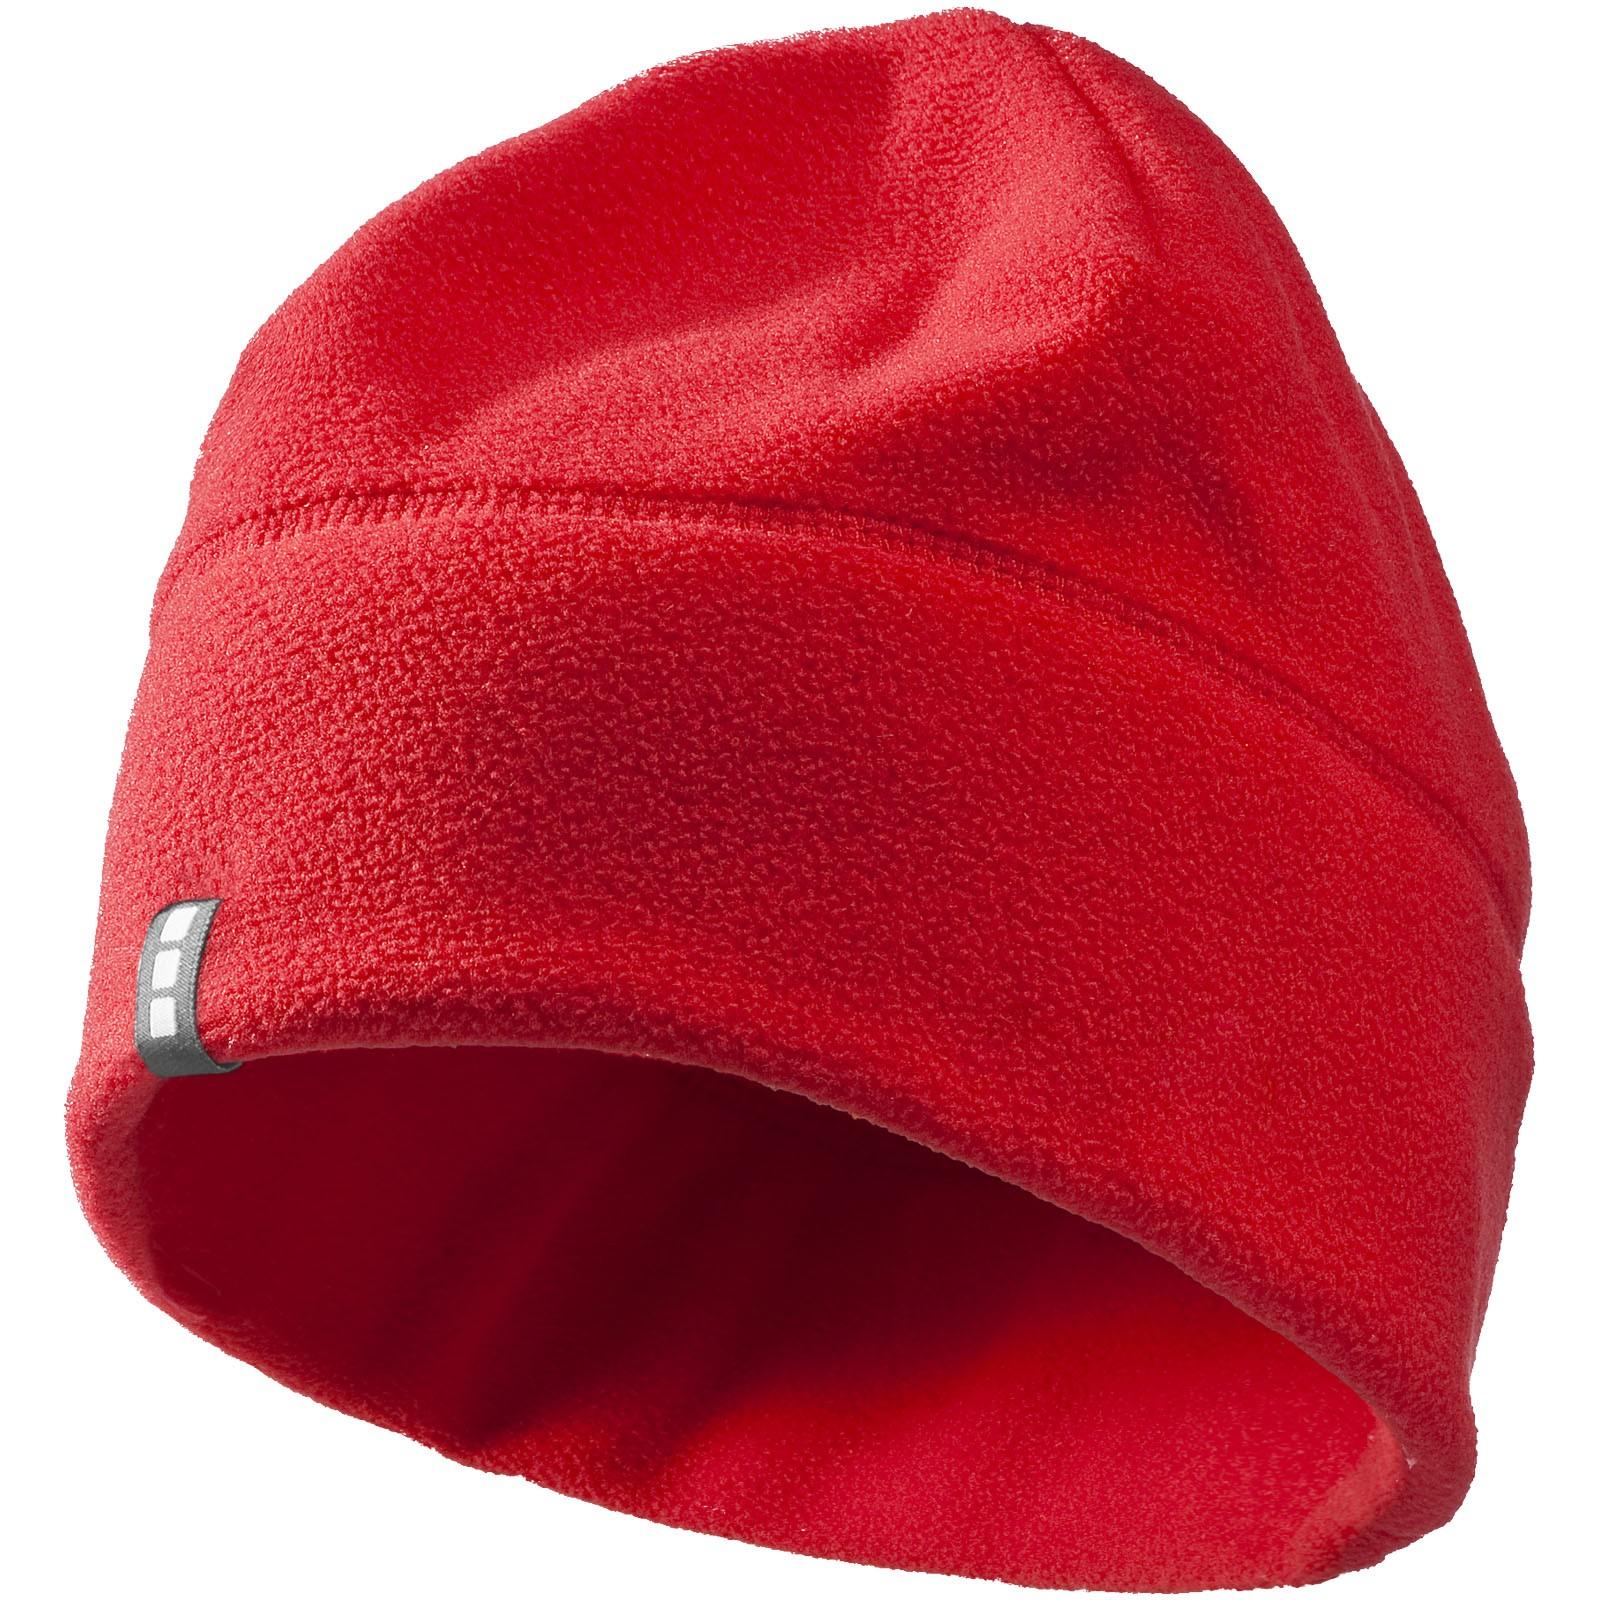 Caliber beanie - Red